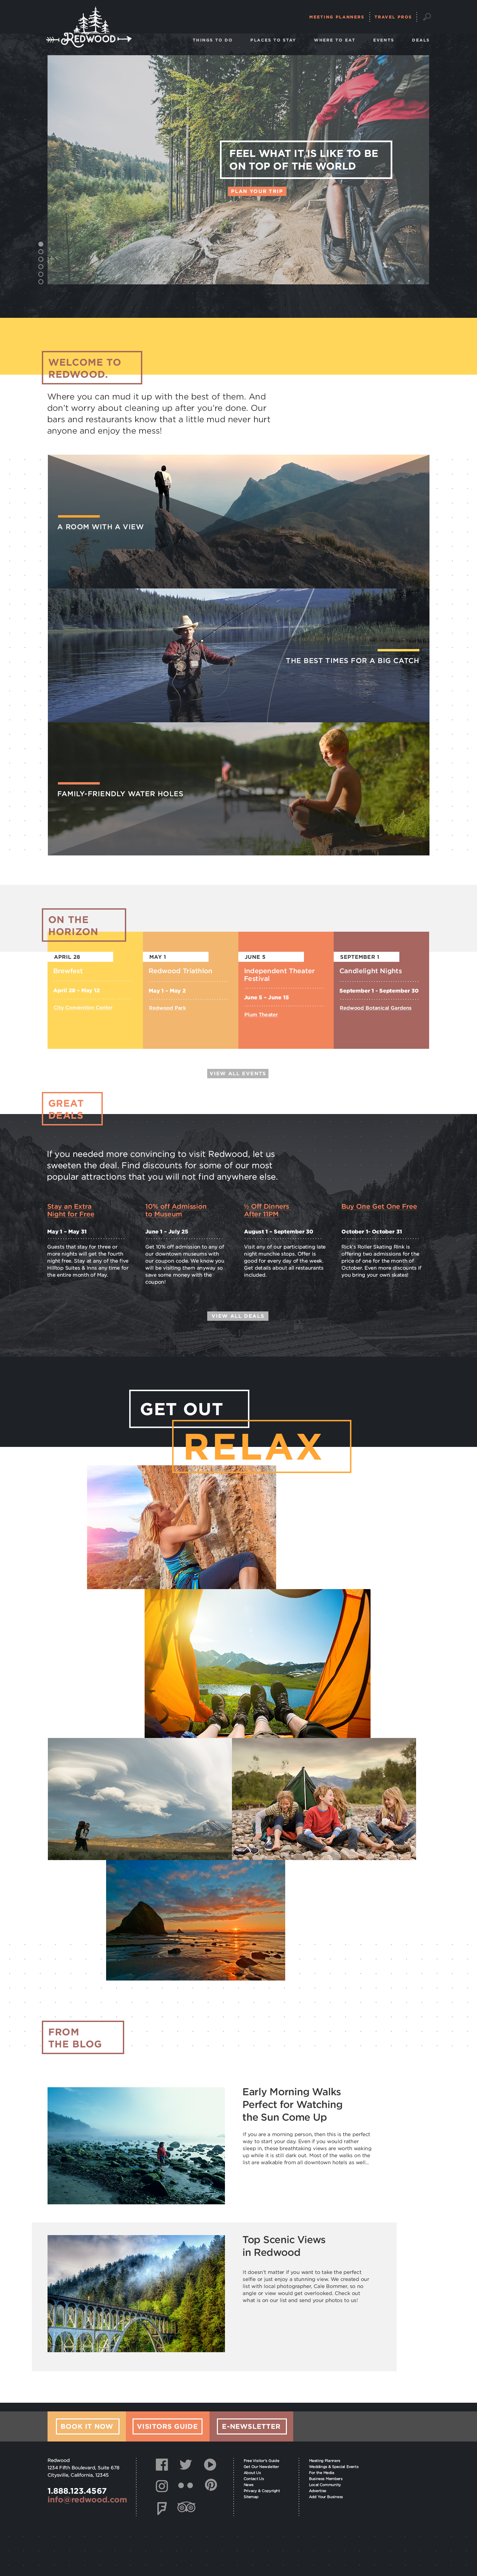 Redwood Theme Homepage Desktop Preview